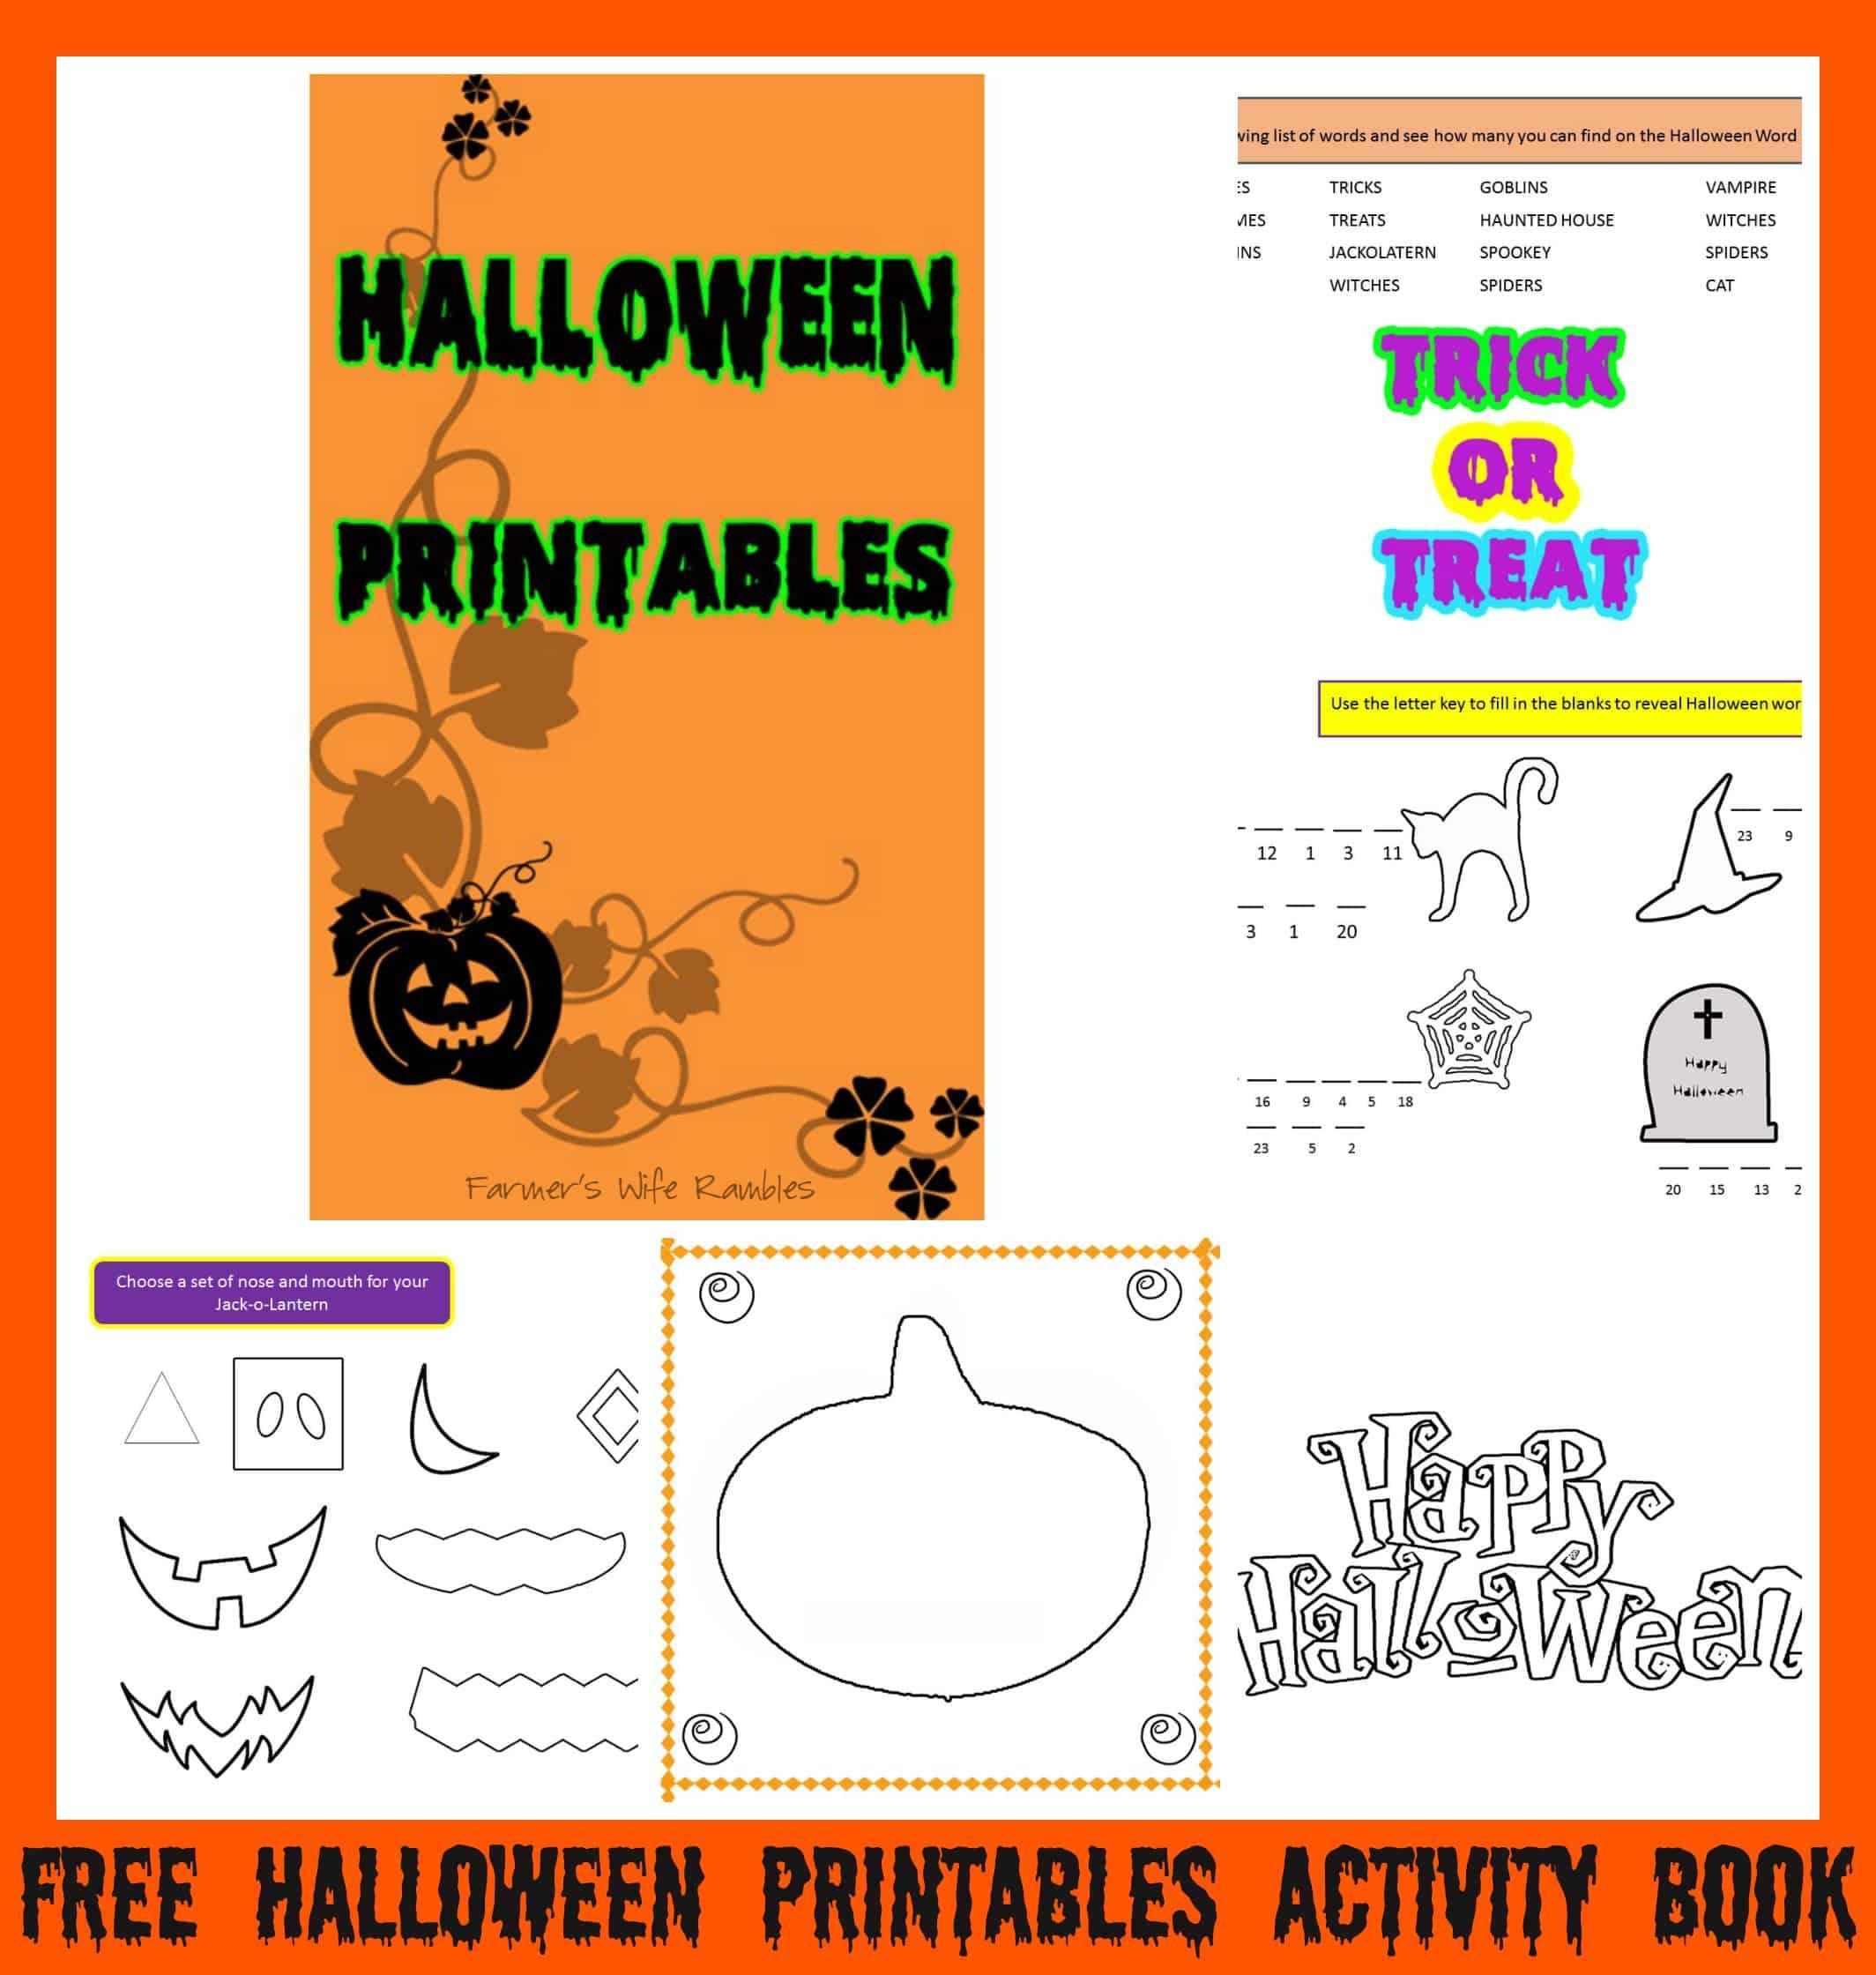 Free Halloween Printables Activity Book